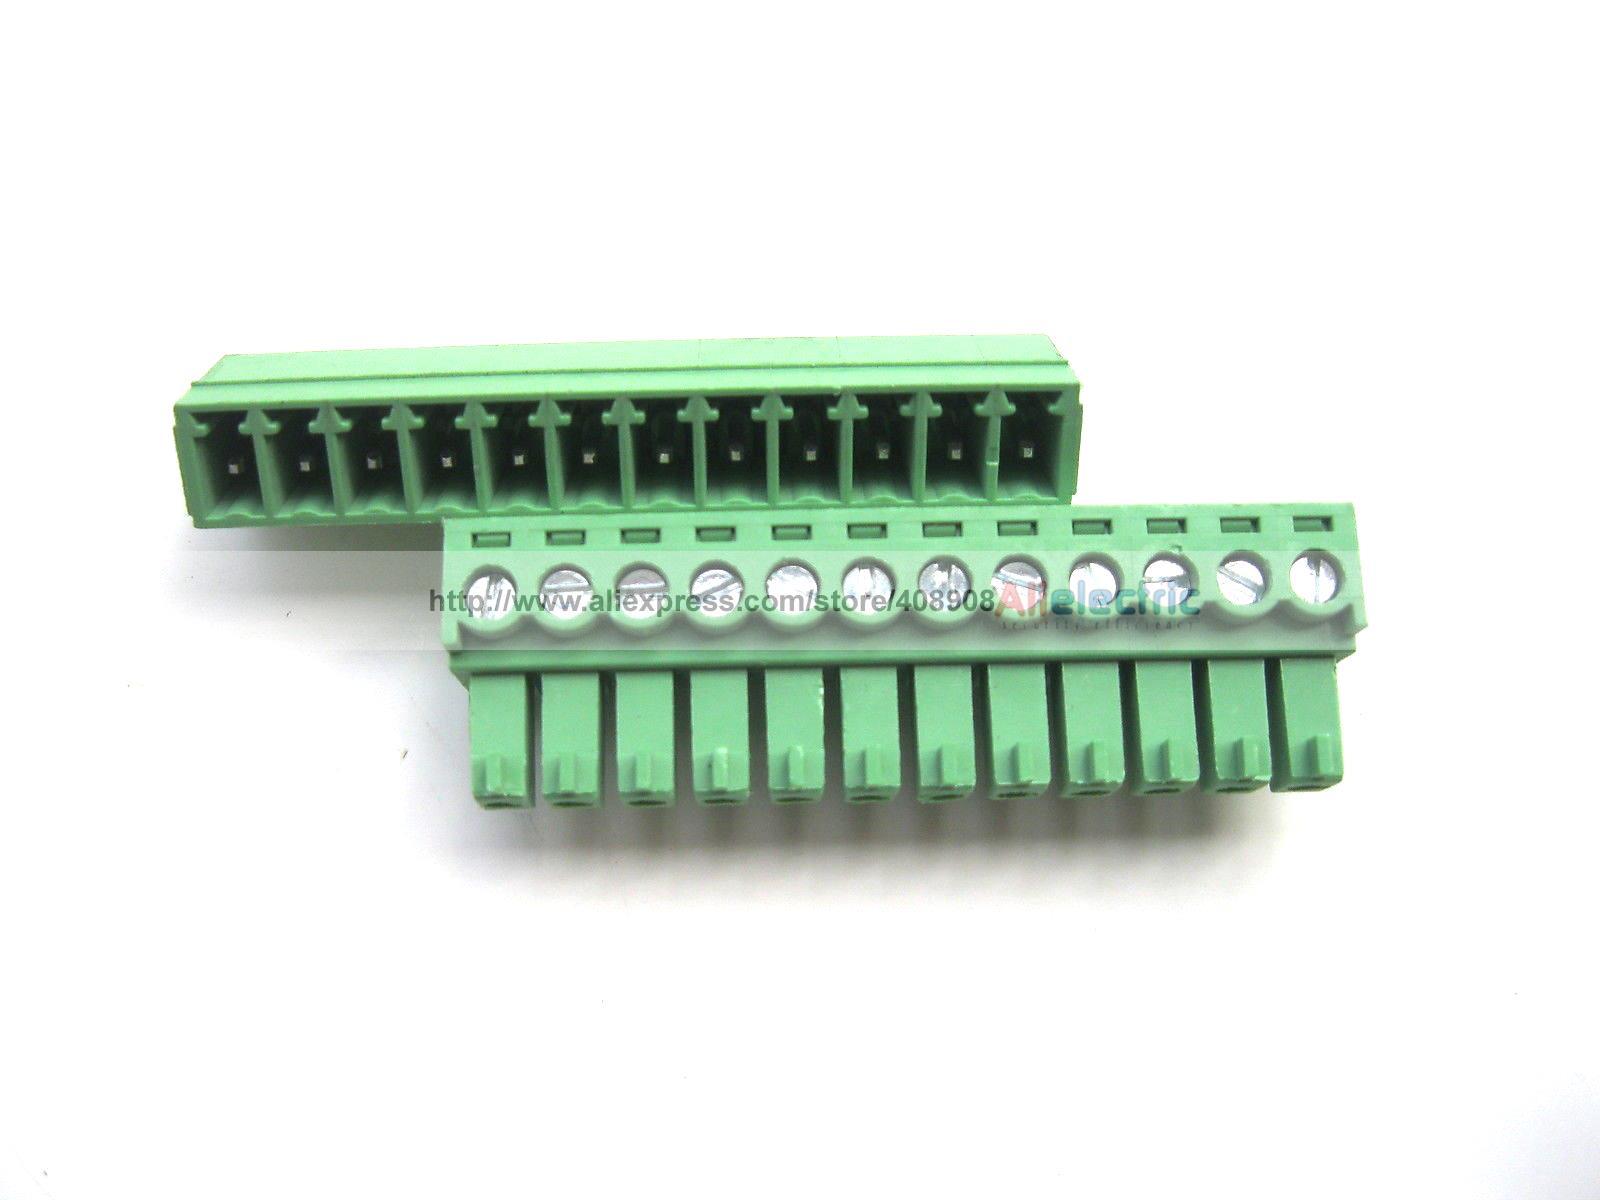 30 Pcs Screw Terminal Block Connector 3.81mm 12 Pin Green Pluggable Type